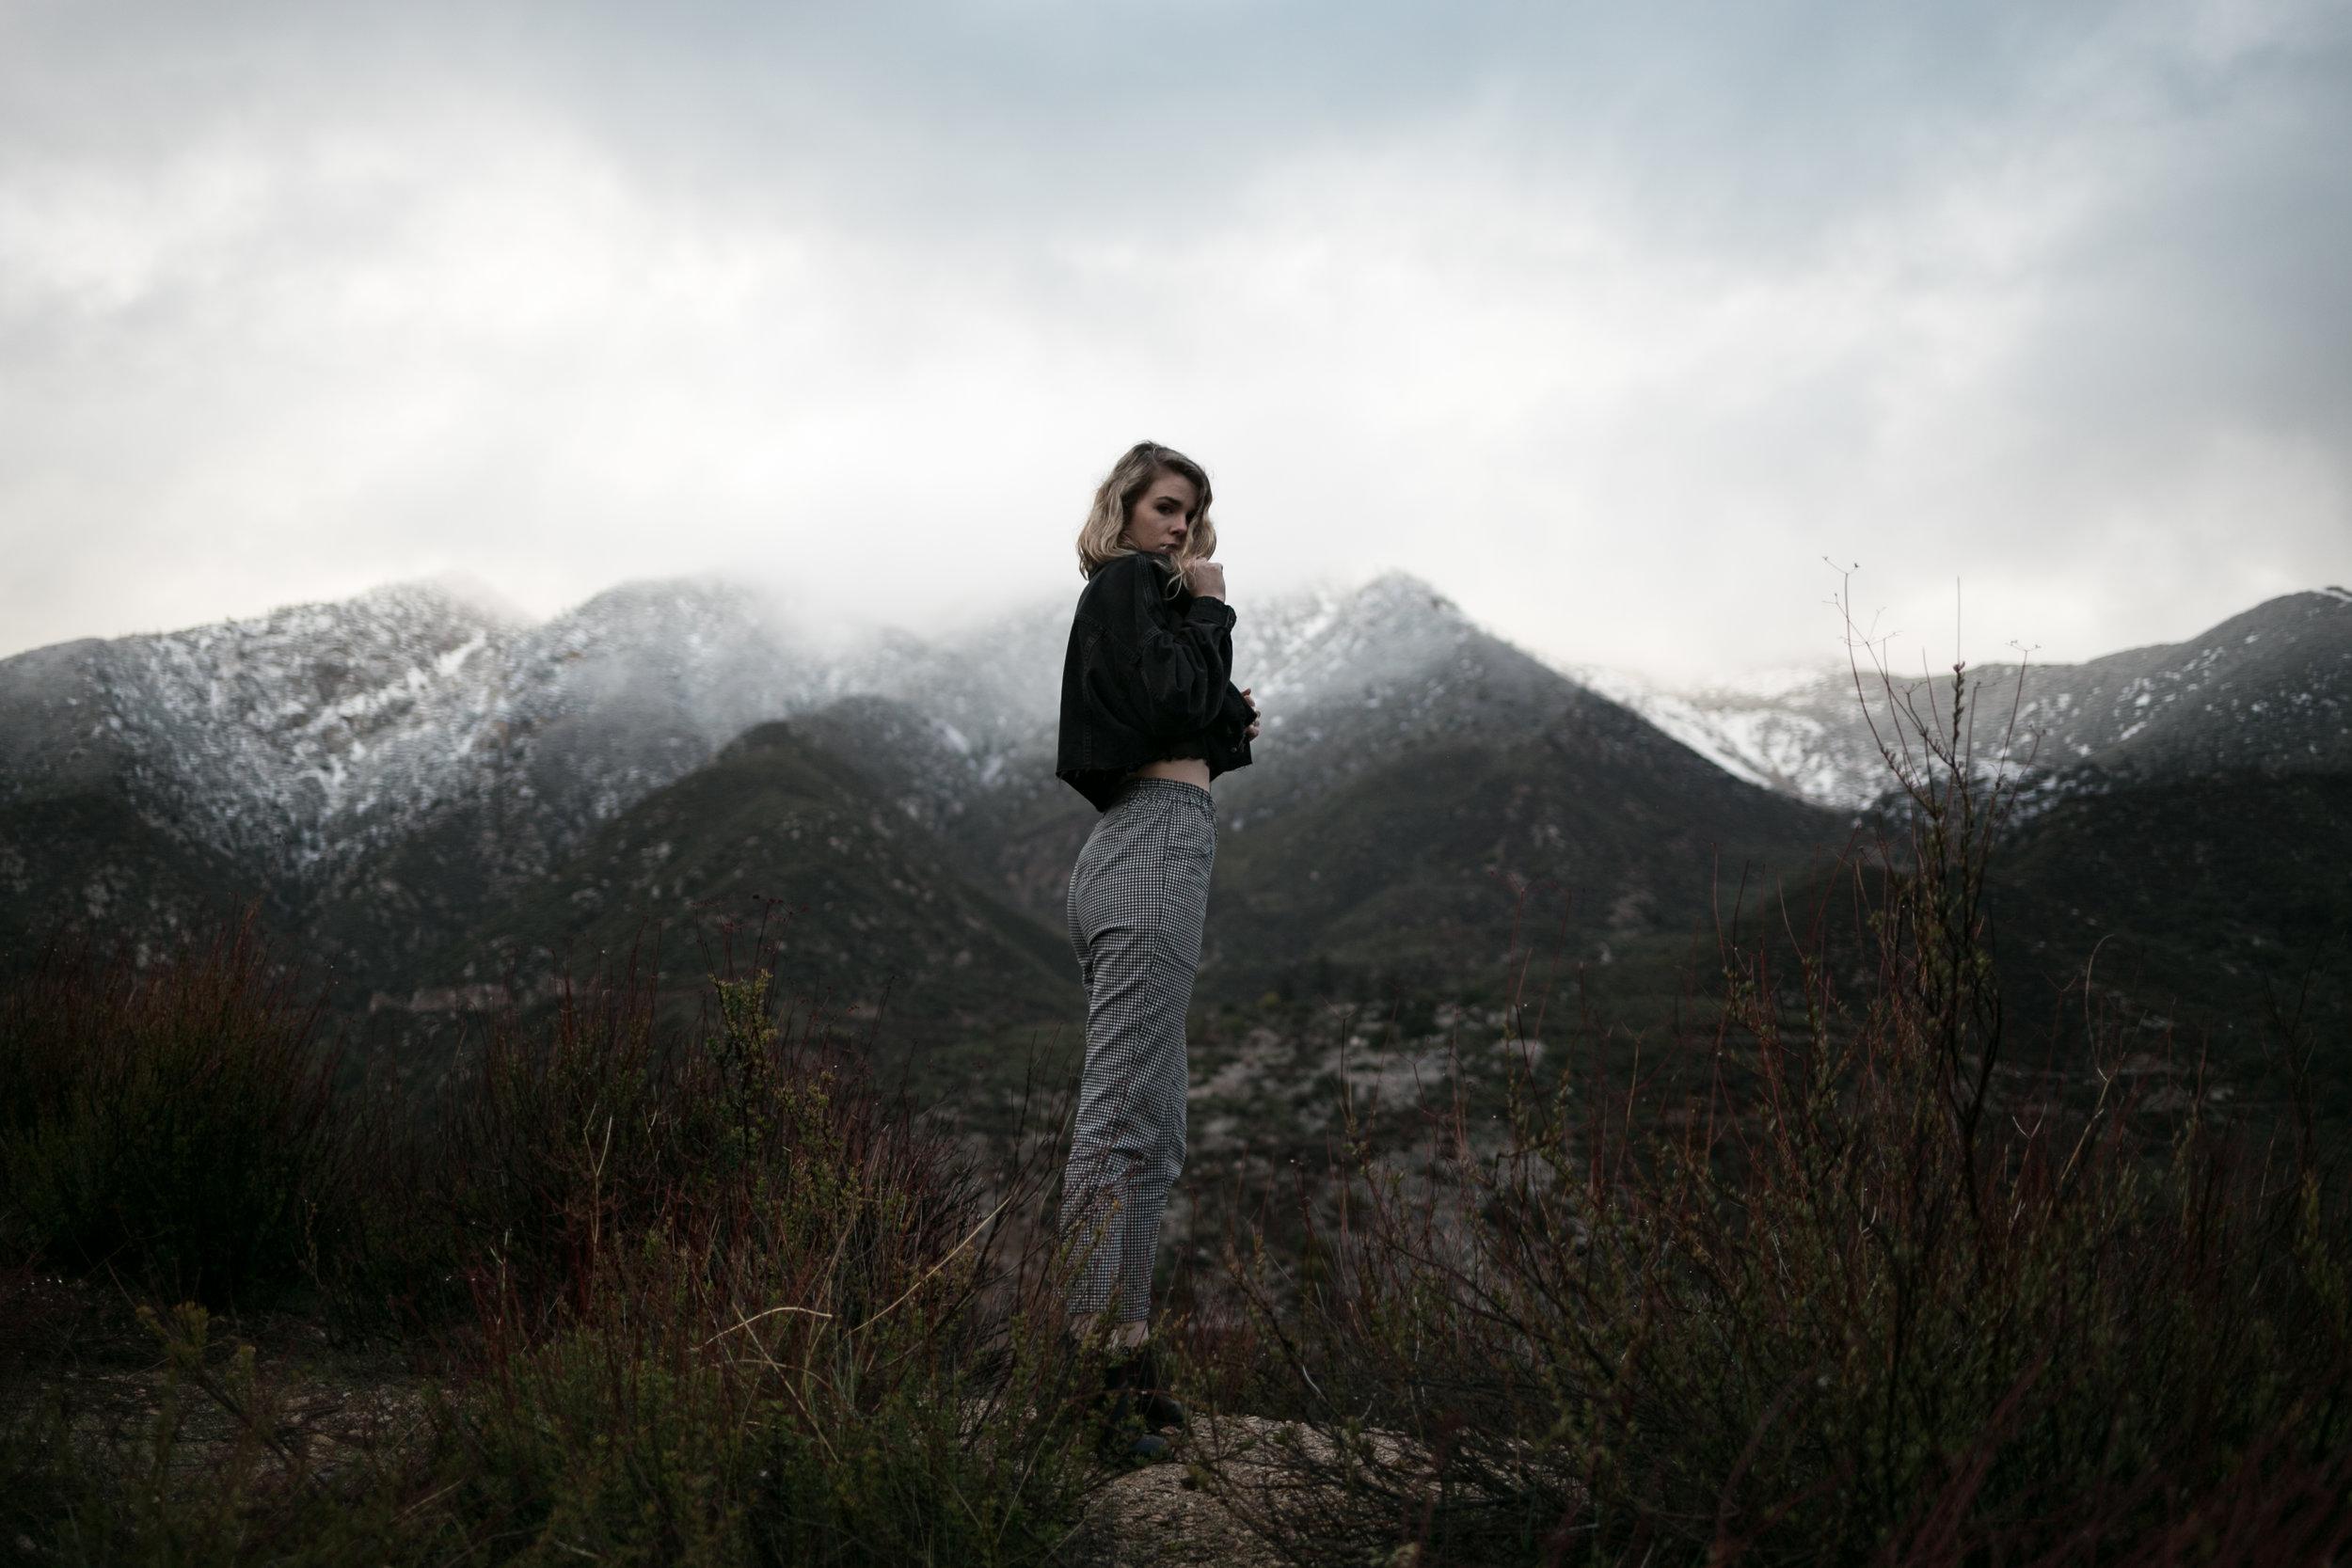 2019-02-10-Kaitlyn-117.jpg